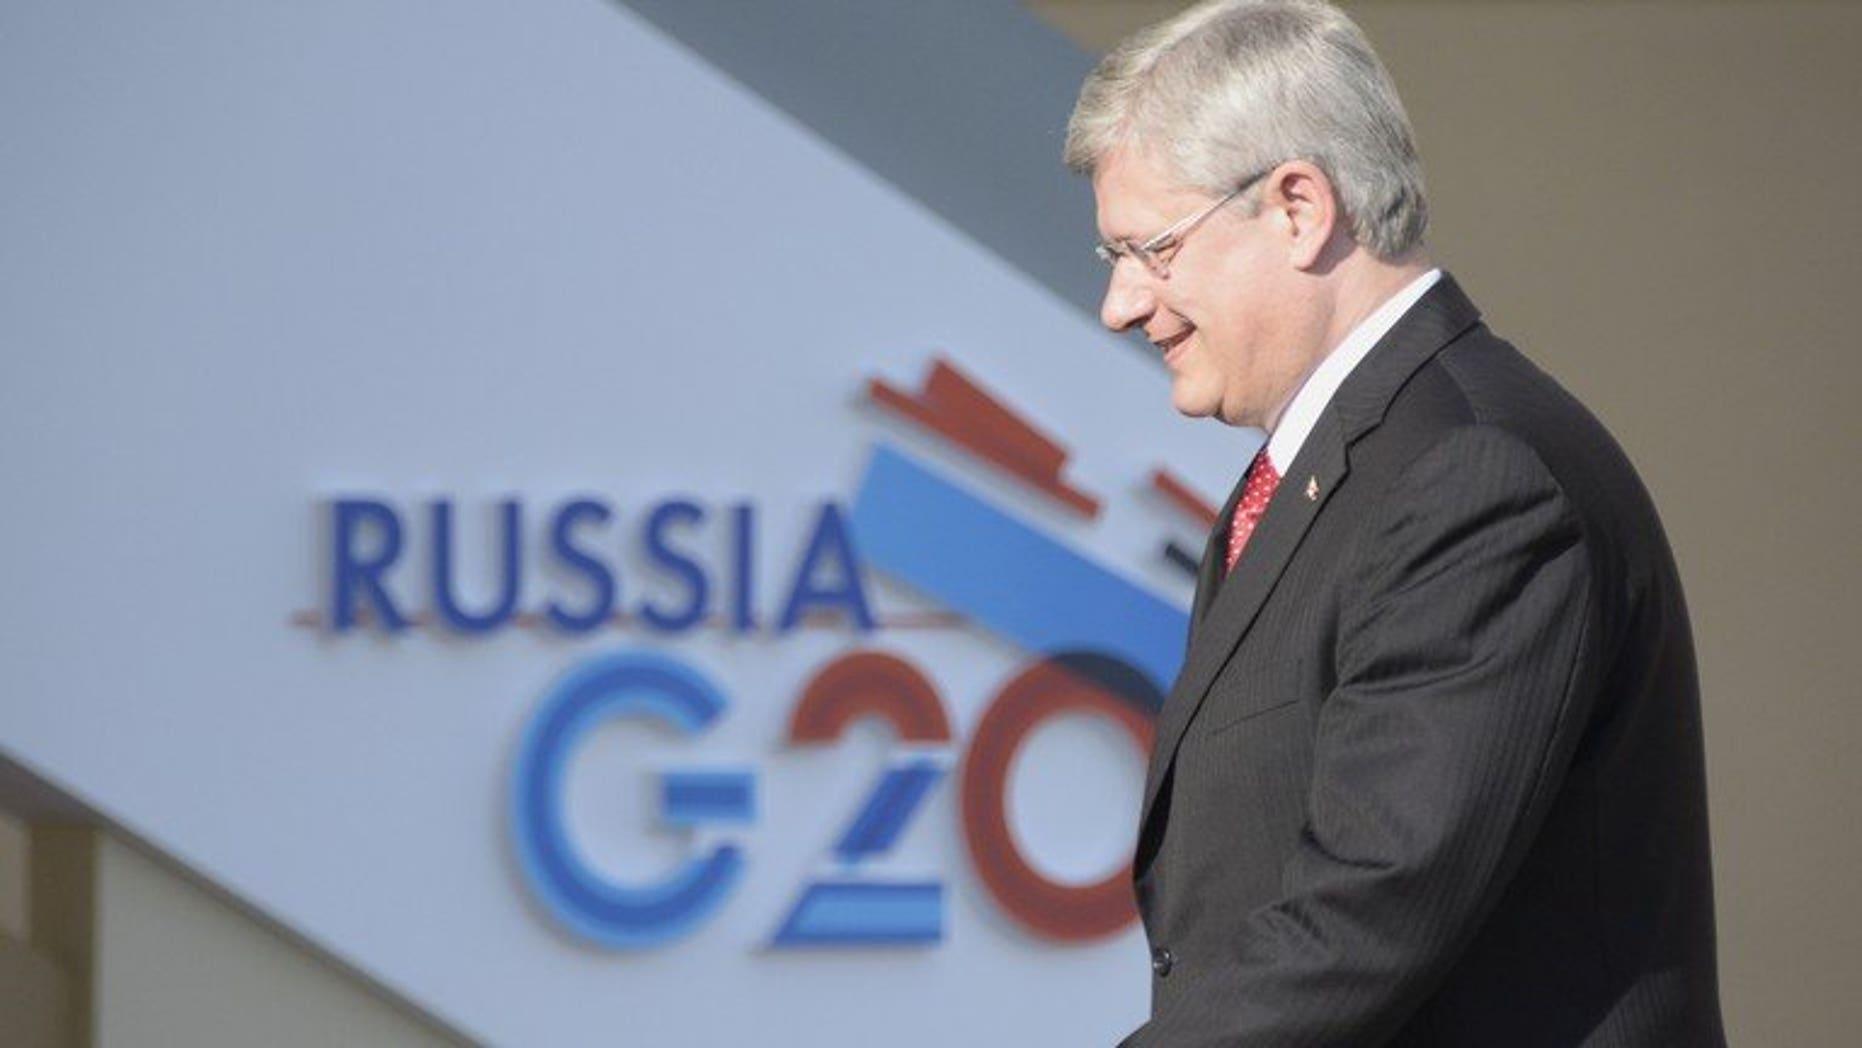 Canada???s Prime Minister Stephen Harper arrives for the start of the G20 summit on September 5, 2013 in Saint Petersburg.